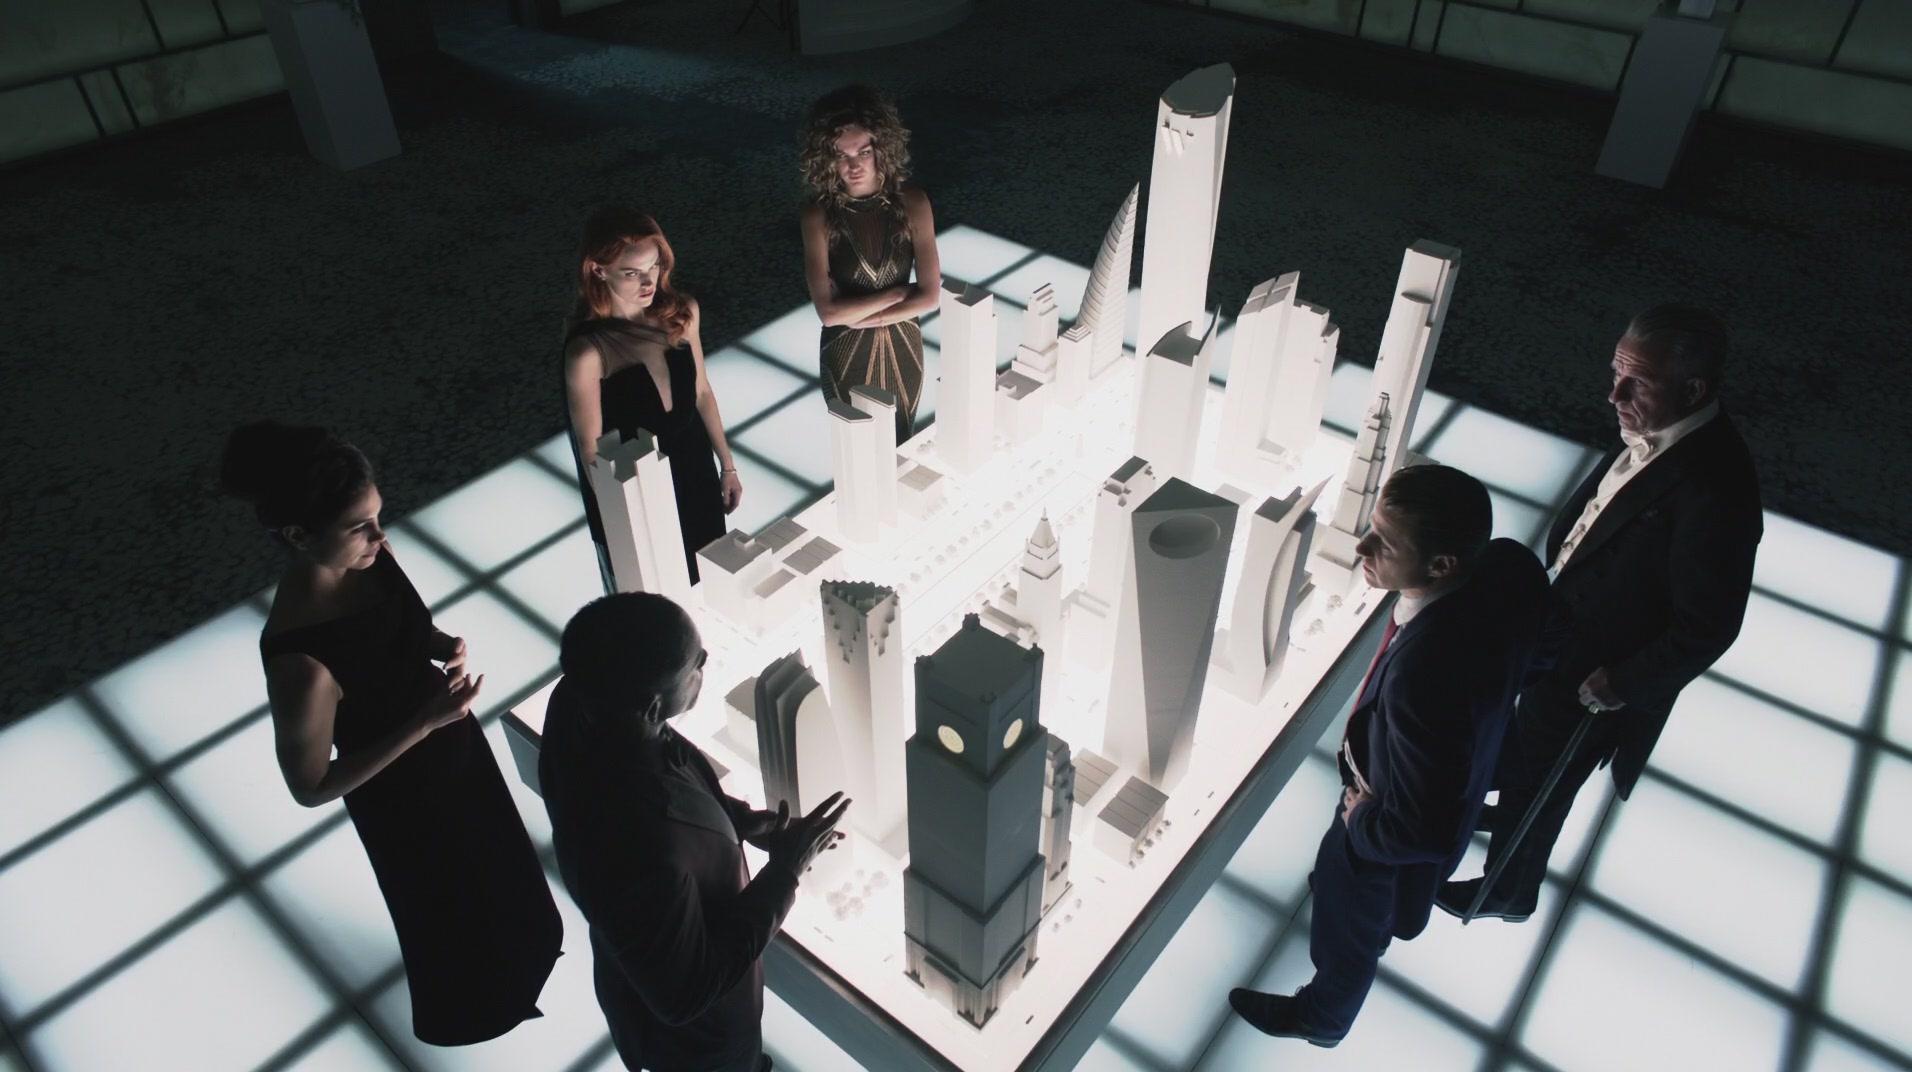 Sean Pertwee, Morena Baccarin, Ben McKenzie, Chris Chalk, Erin Richards, and Lili Simmons in Gotham (2014)